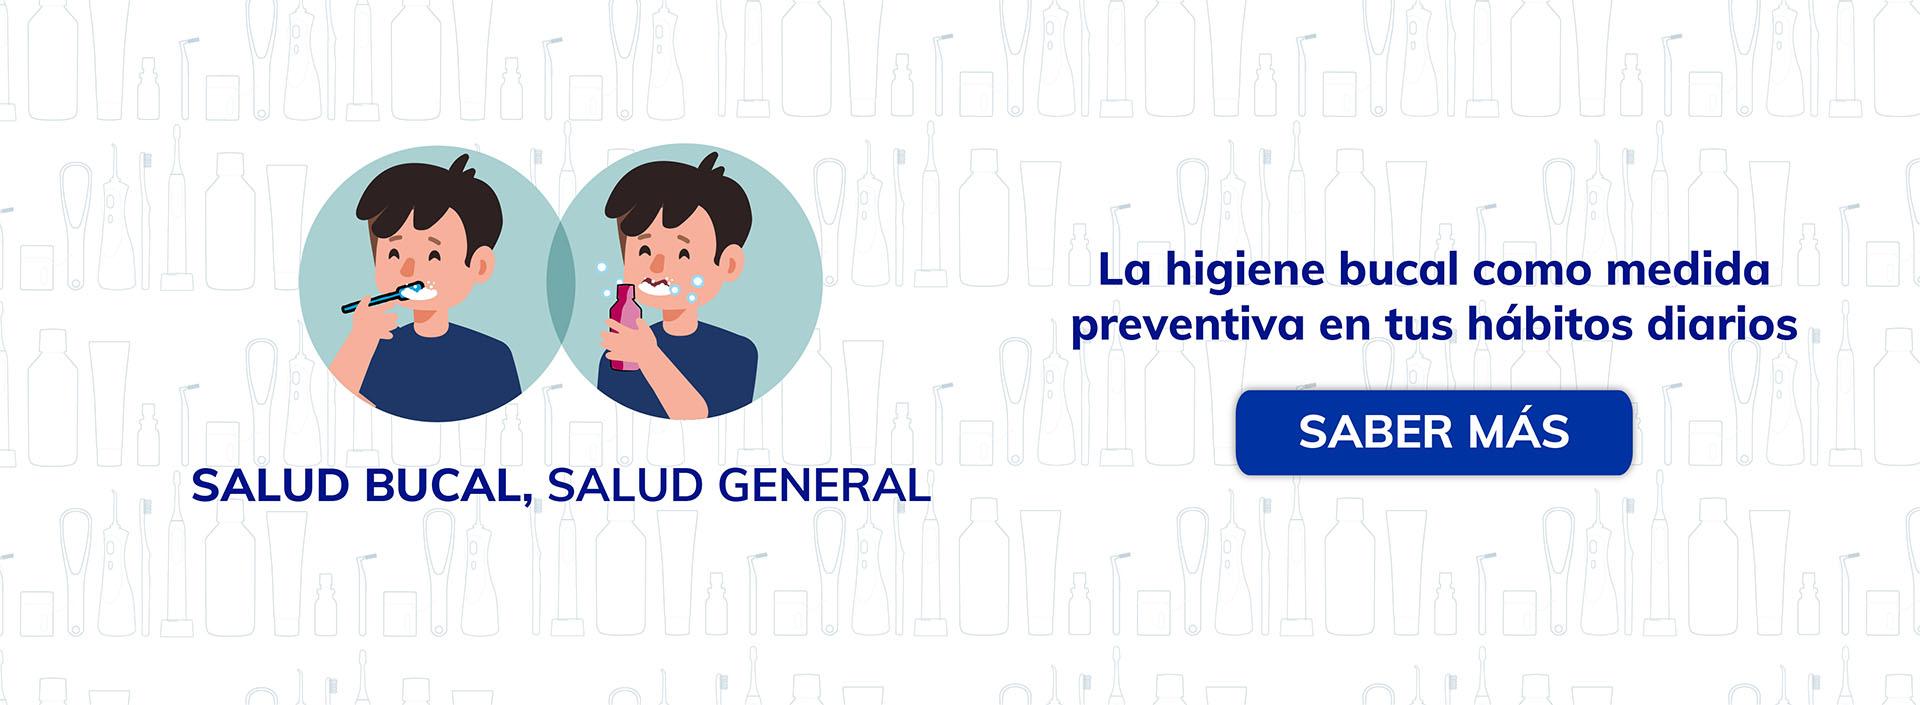 Medidas-higiene-bucal